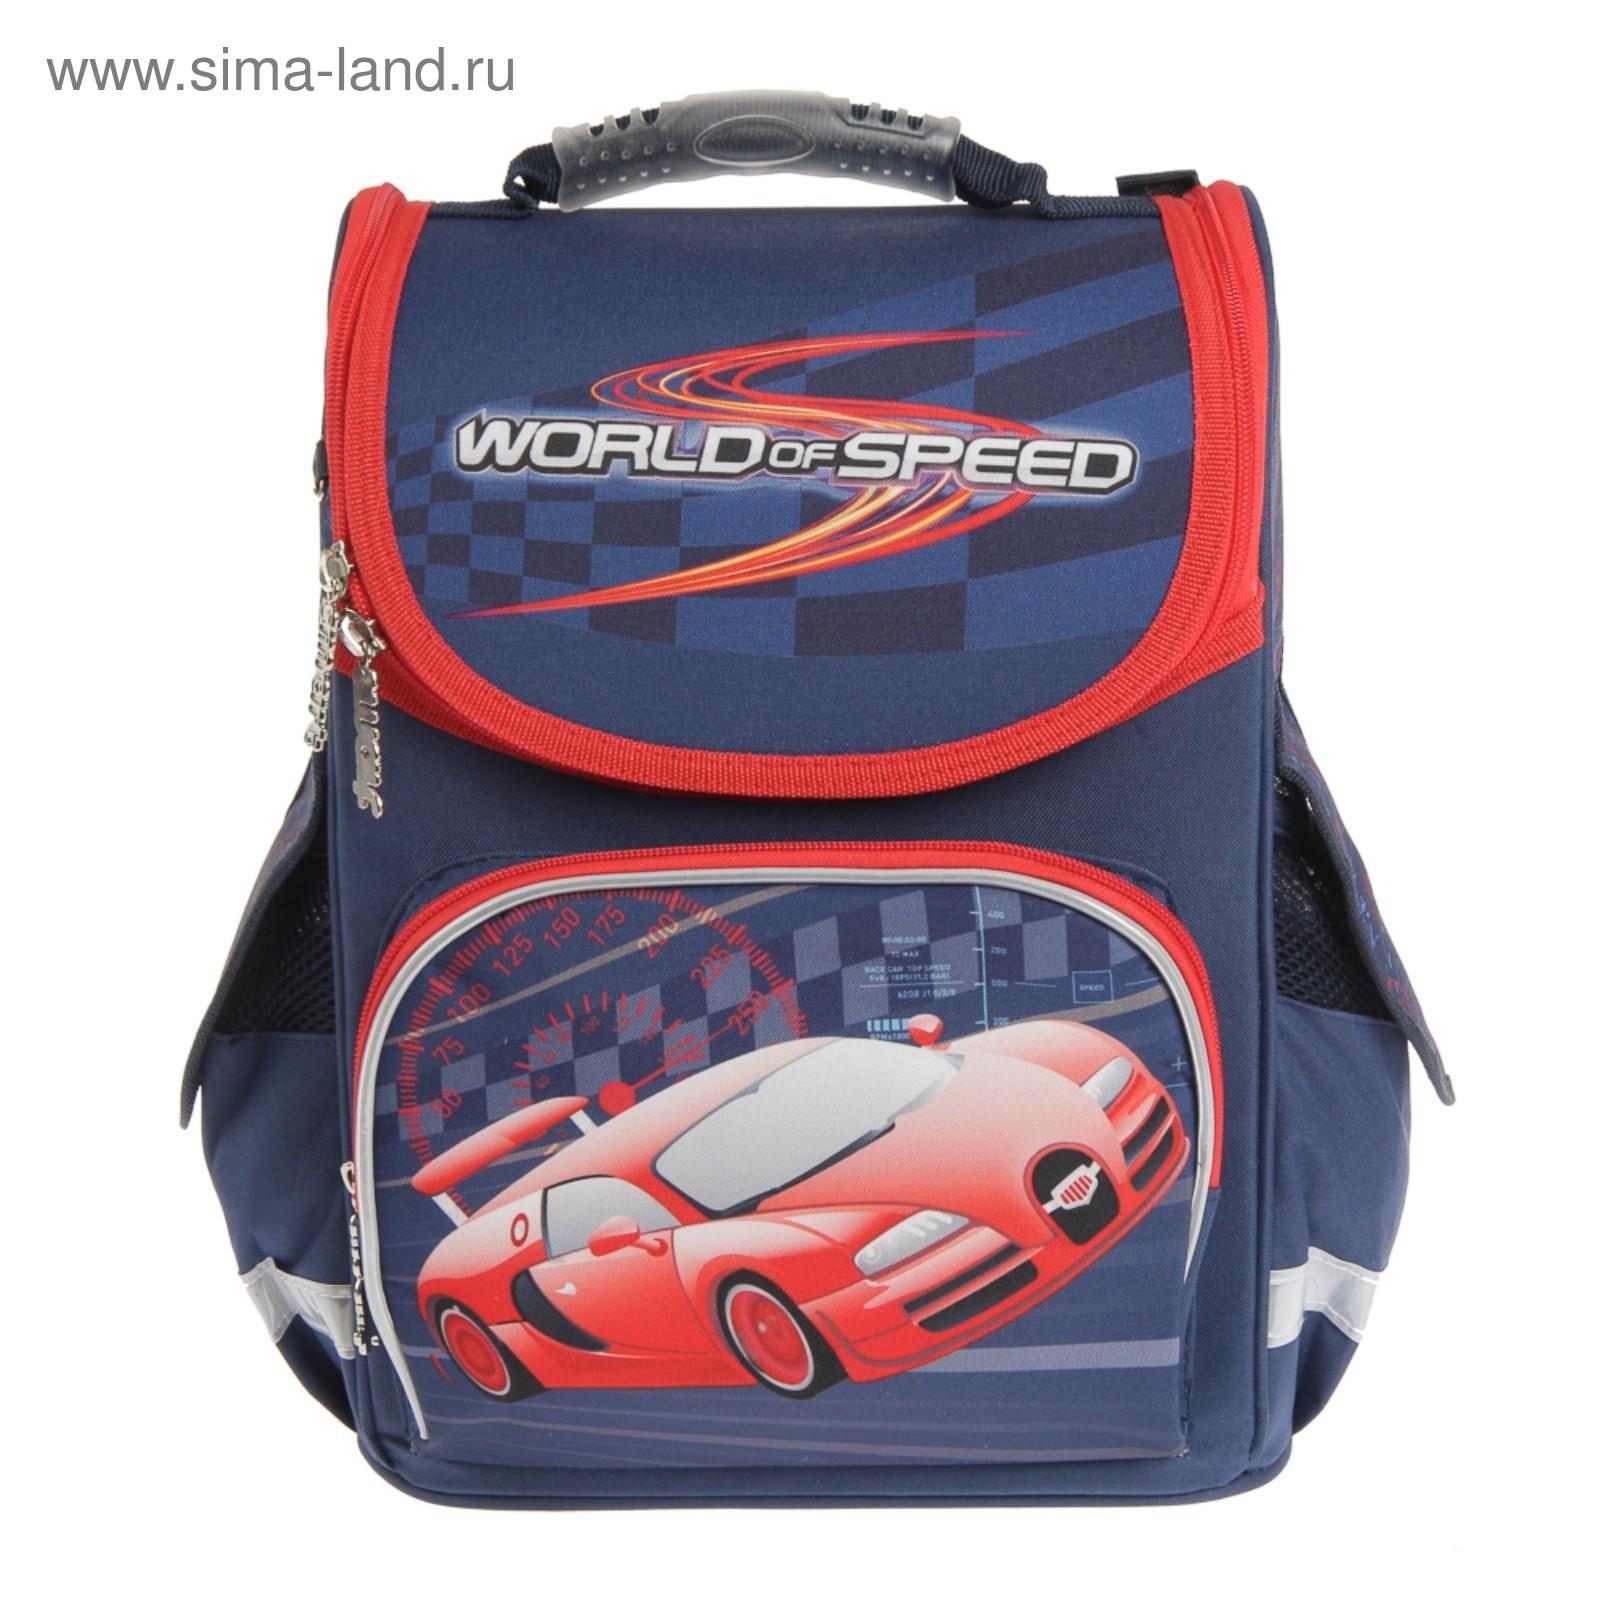 12f856473829 Ранец Smart PG-11 34*26*14 для мальчика, World of speed, синий ...